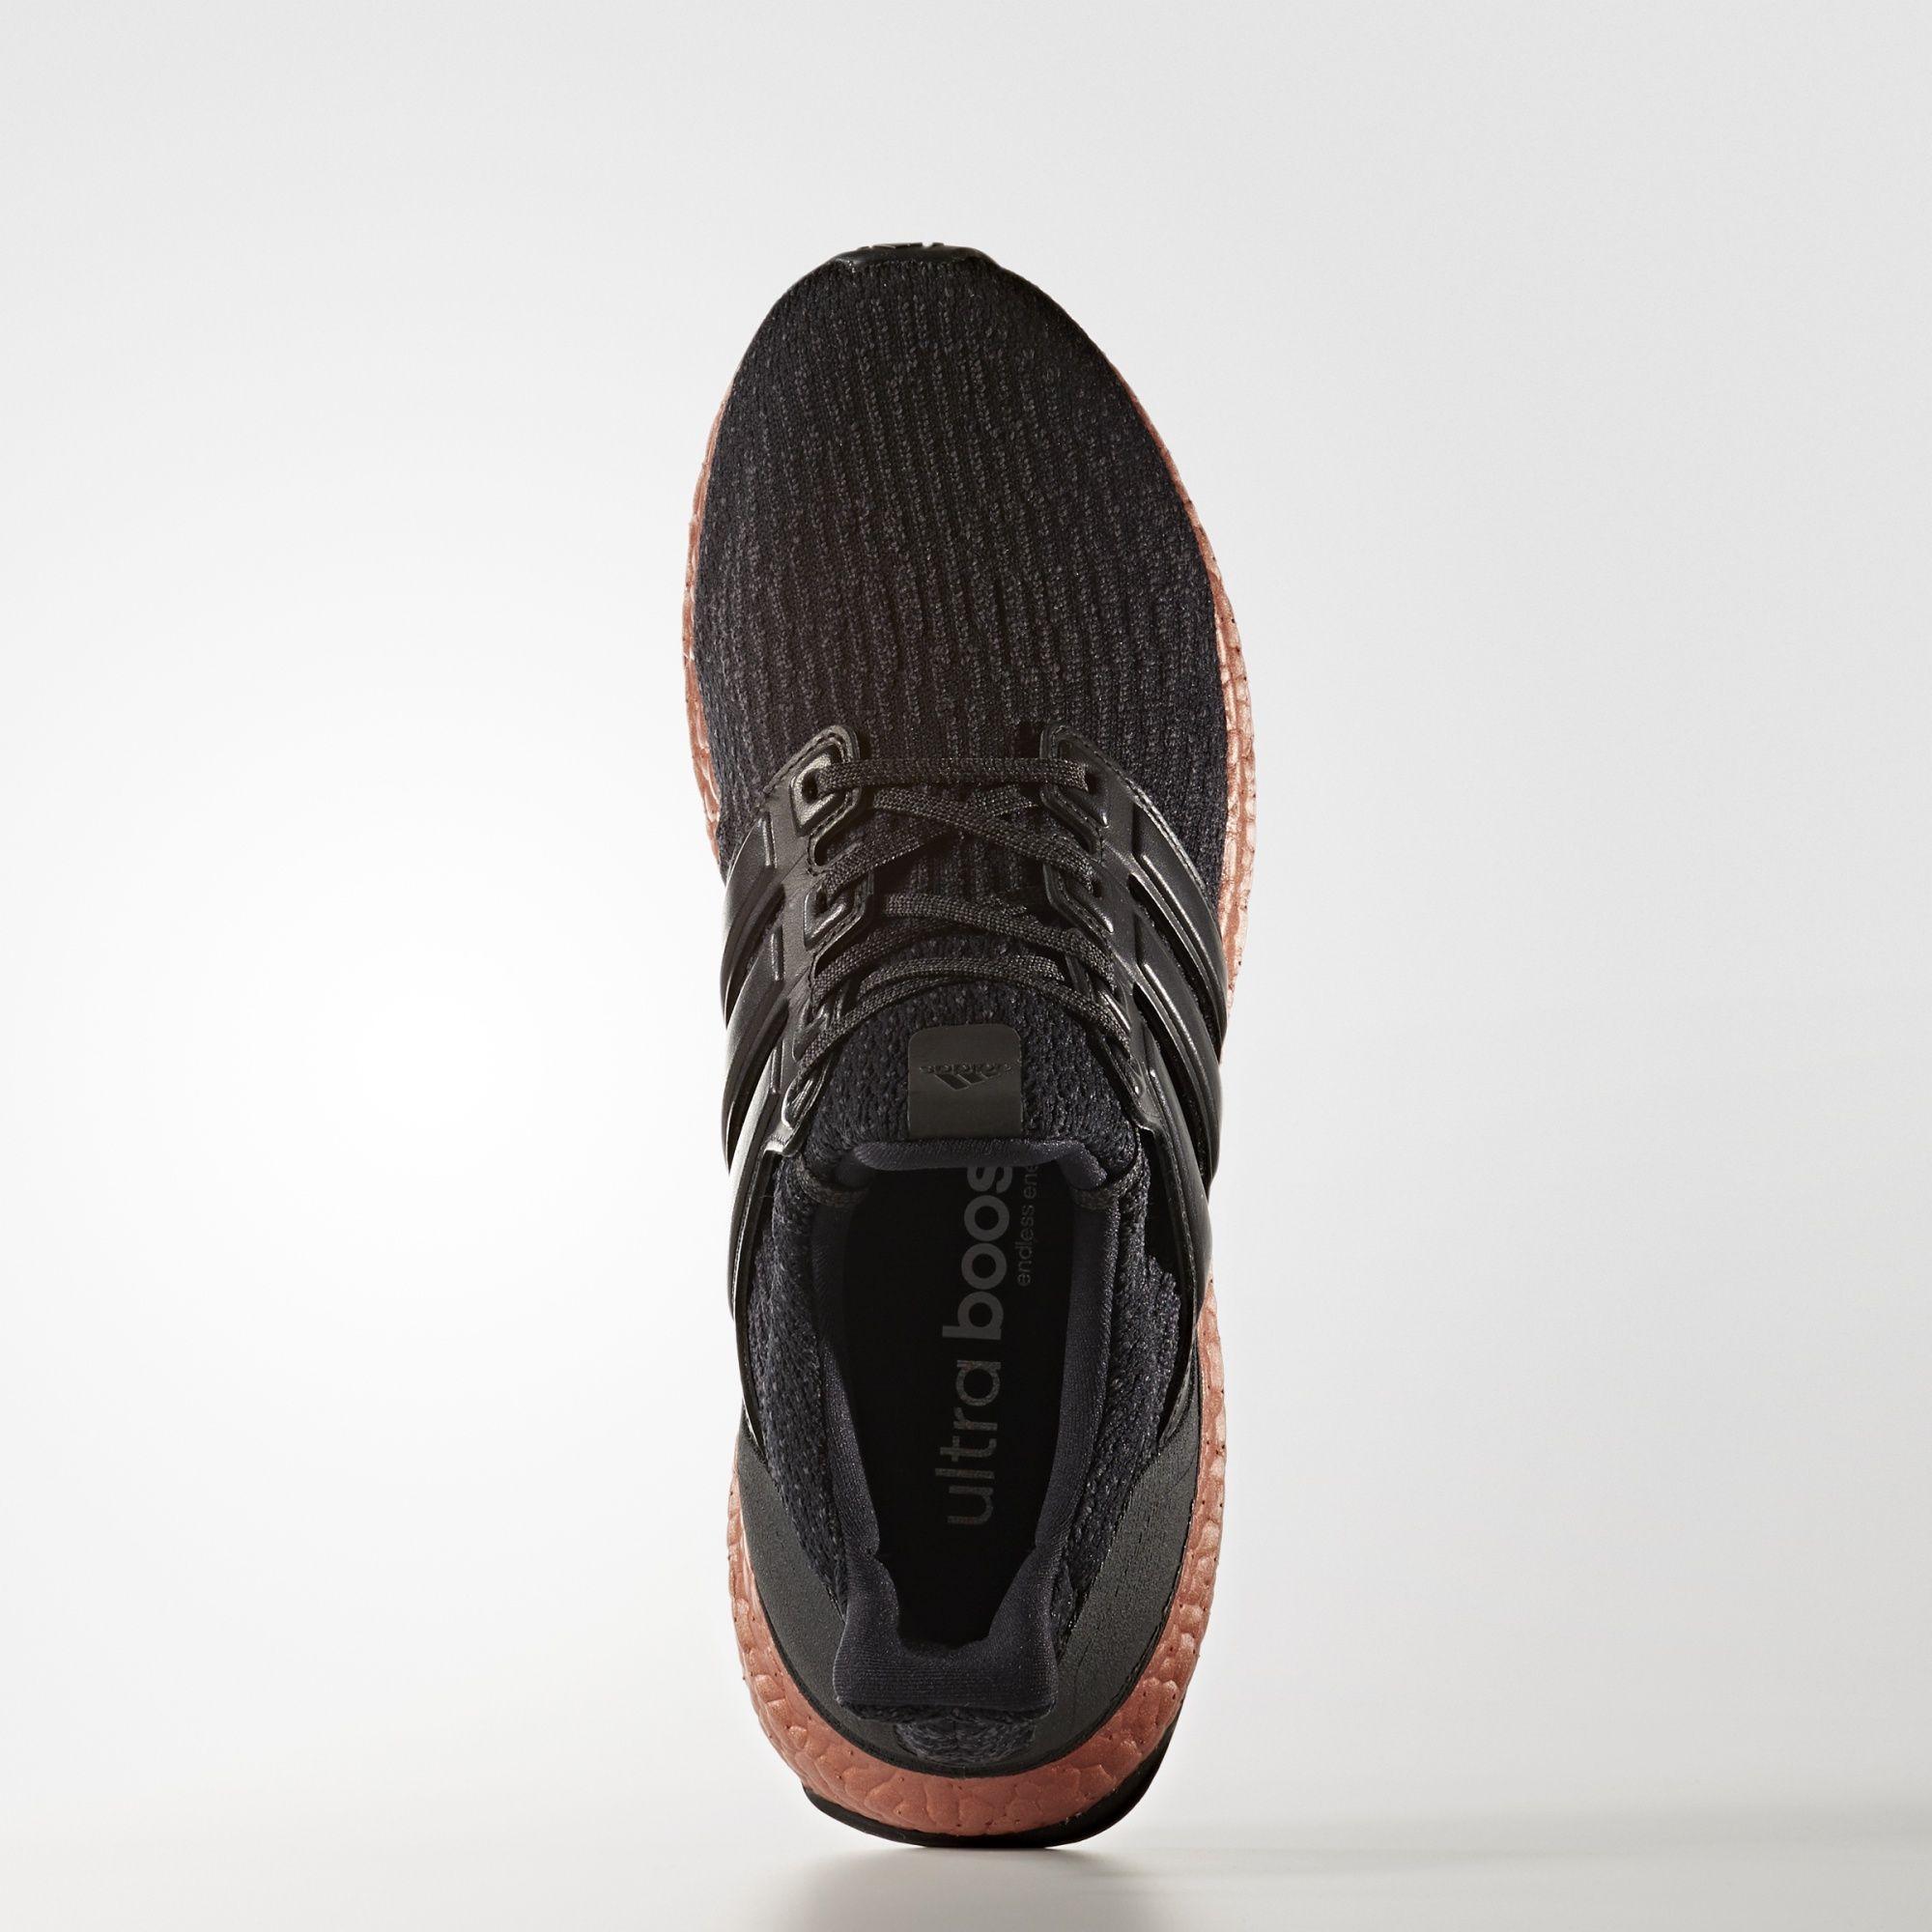 adidas Ultra Boost 3 Tech Rust CG4086 1